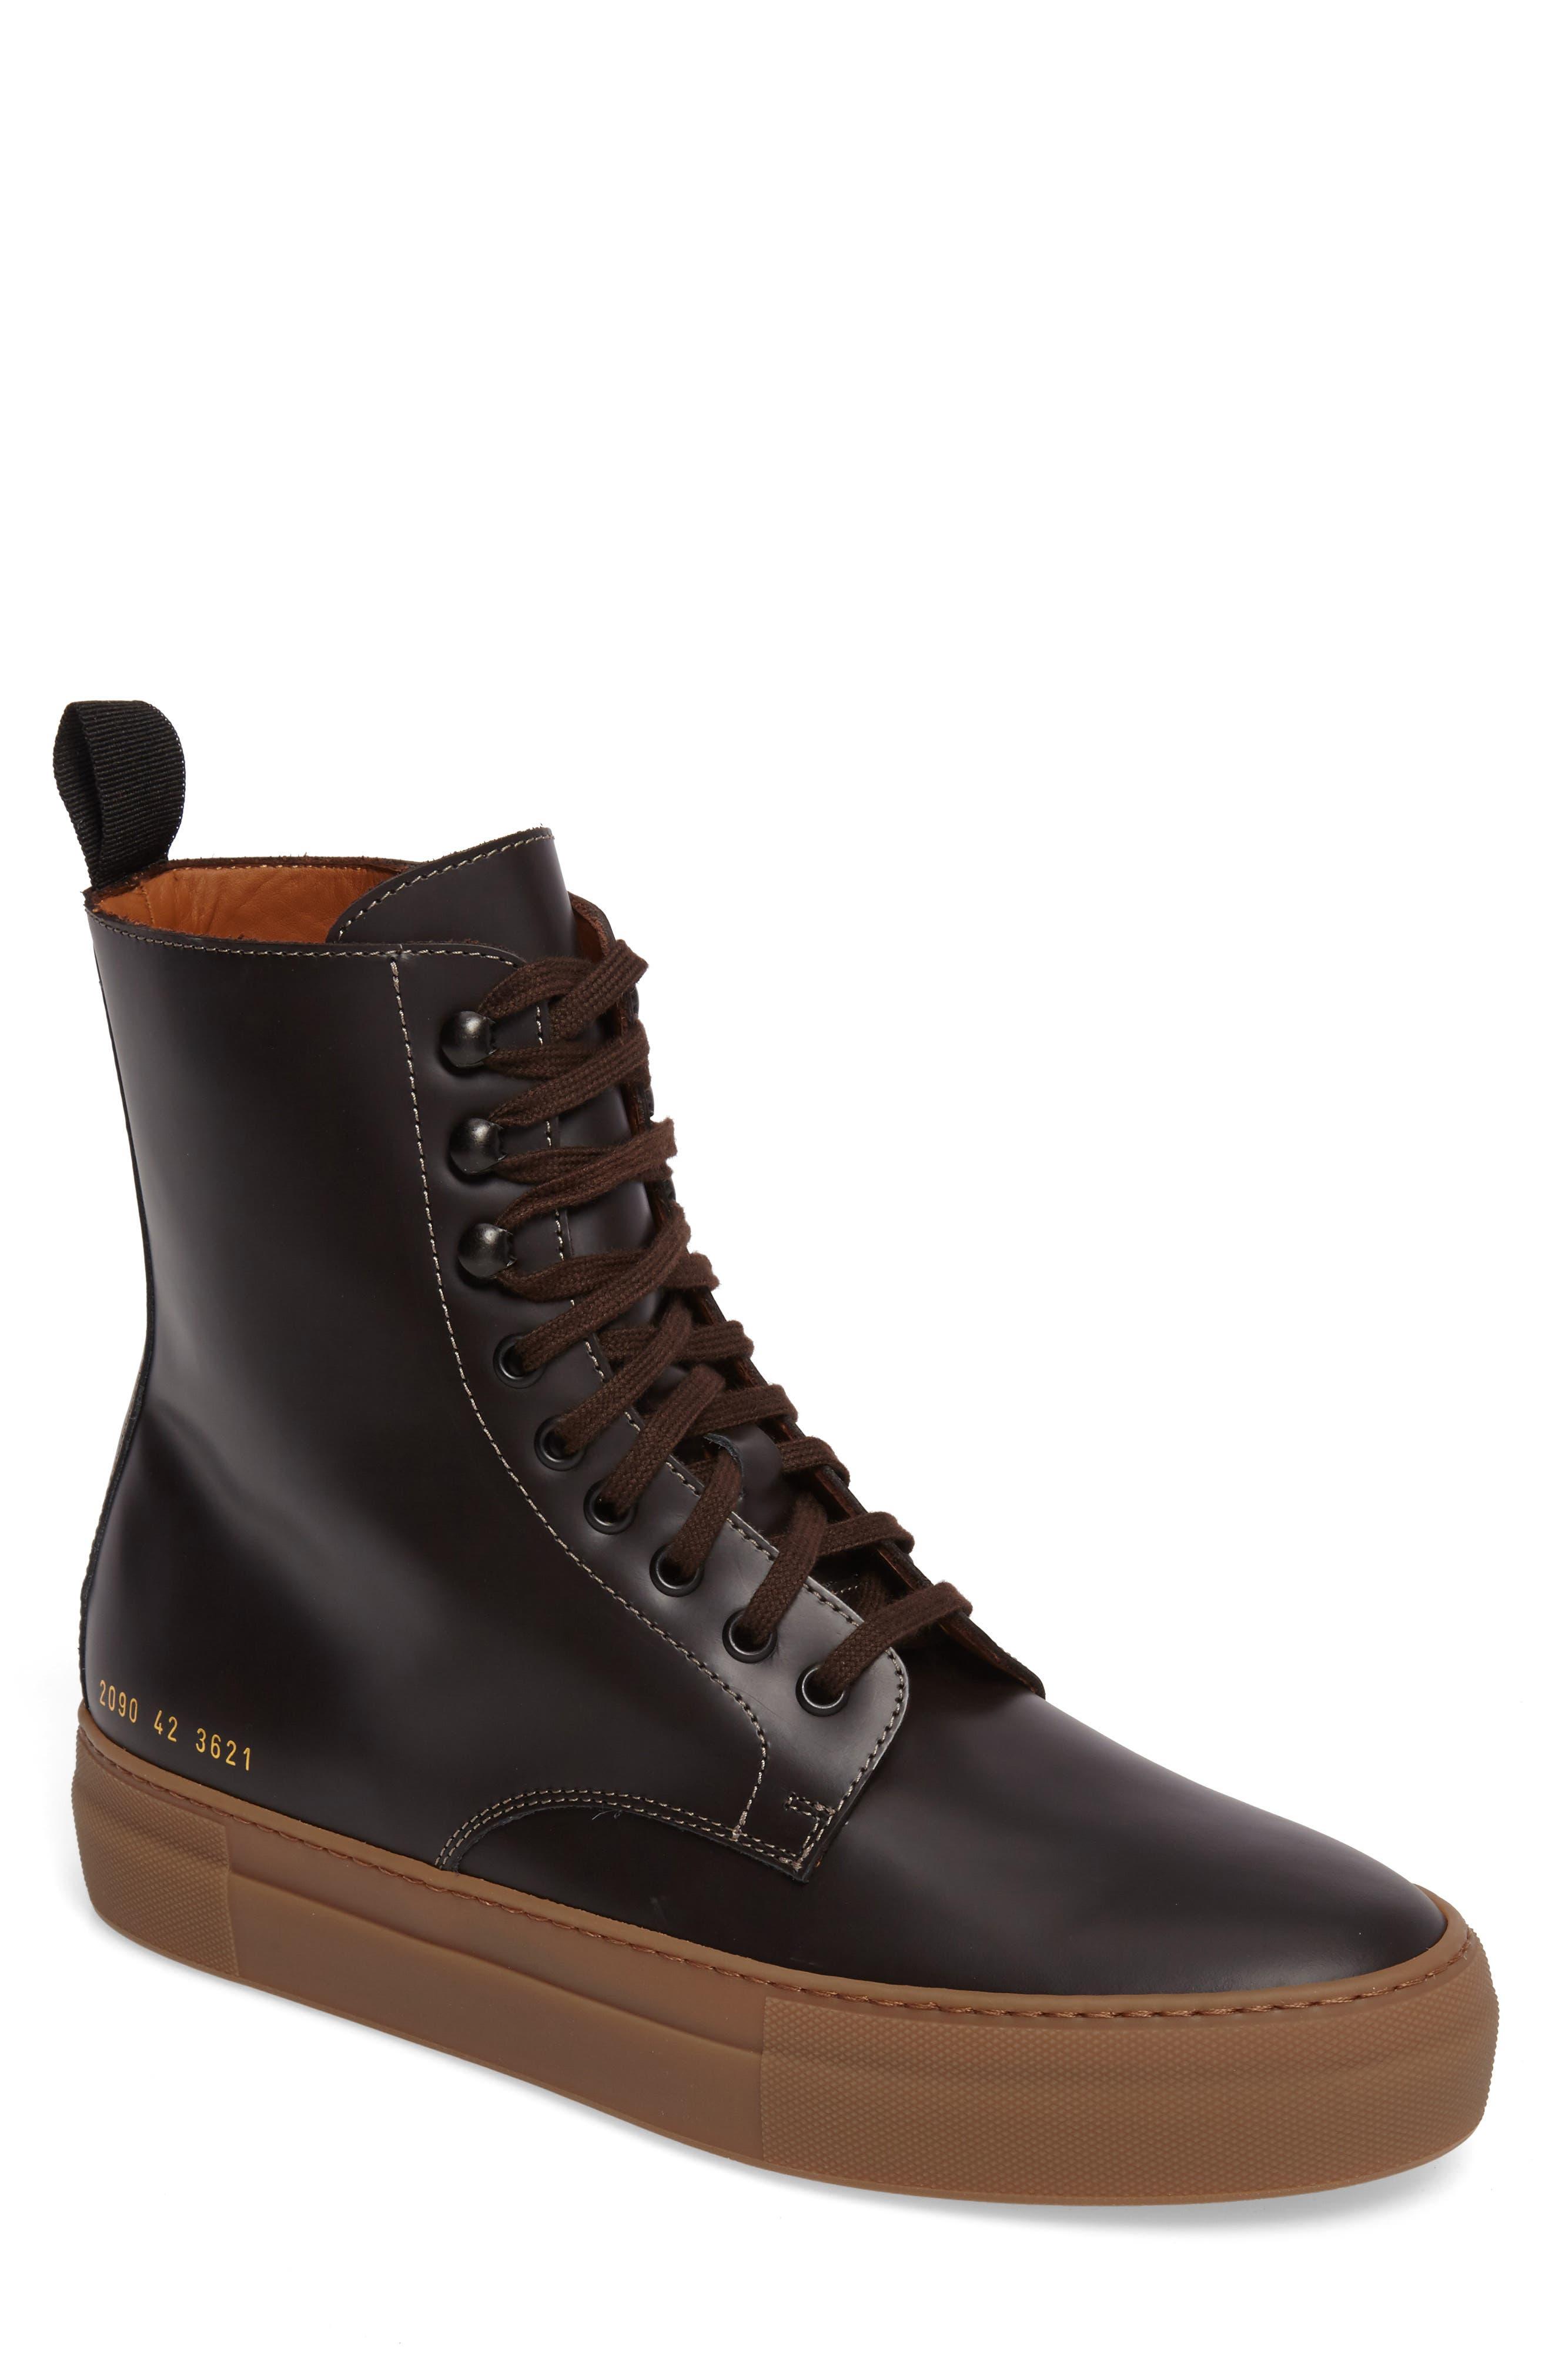 Common Projects x Robert Geller Plain Toe Boot (Men)